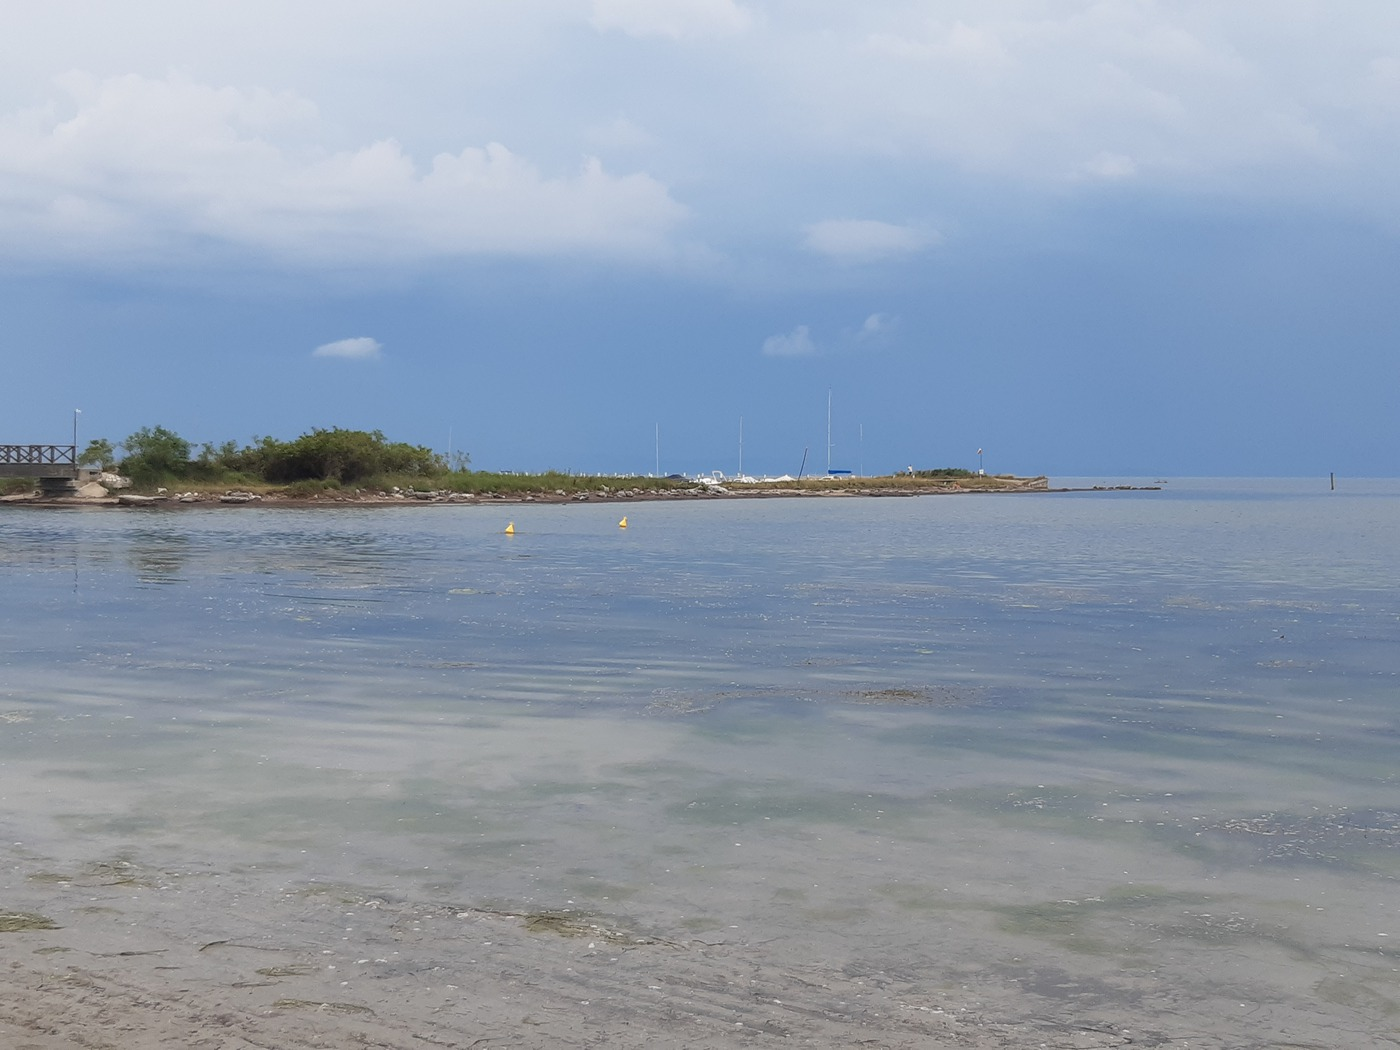 Grado Pineta, Sandstrand in Friaul-Julisch Venetien